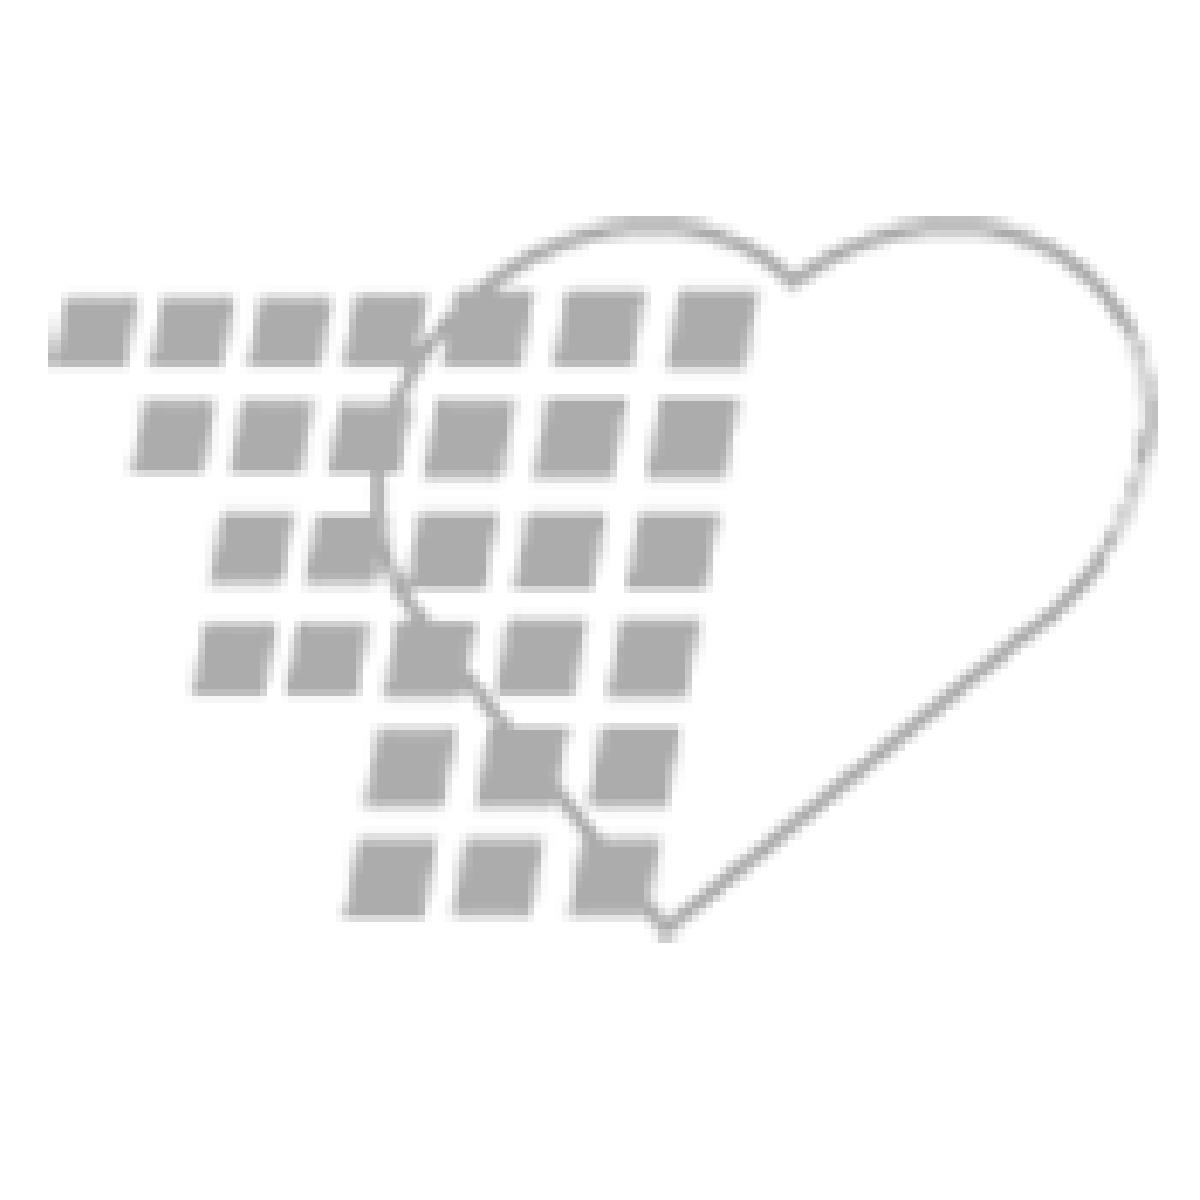 06-26-2503 B  Braun Introcan Safety® IV Catheter - 24G x 0 75